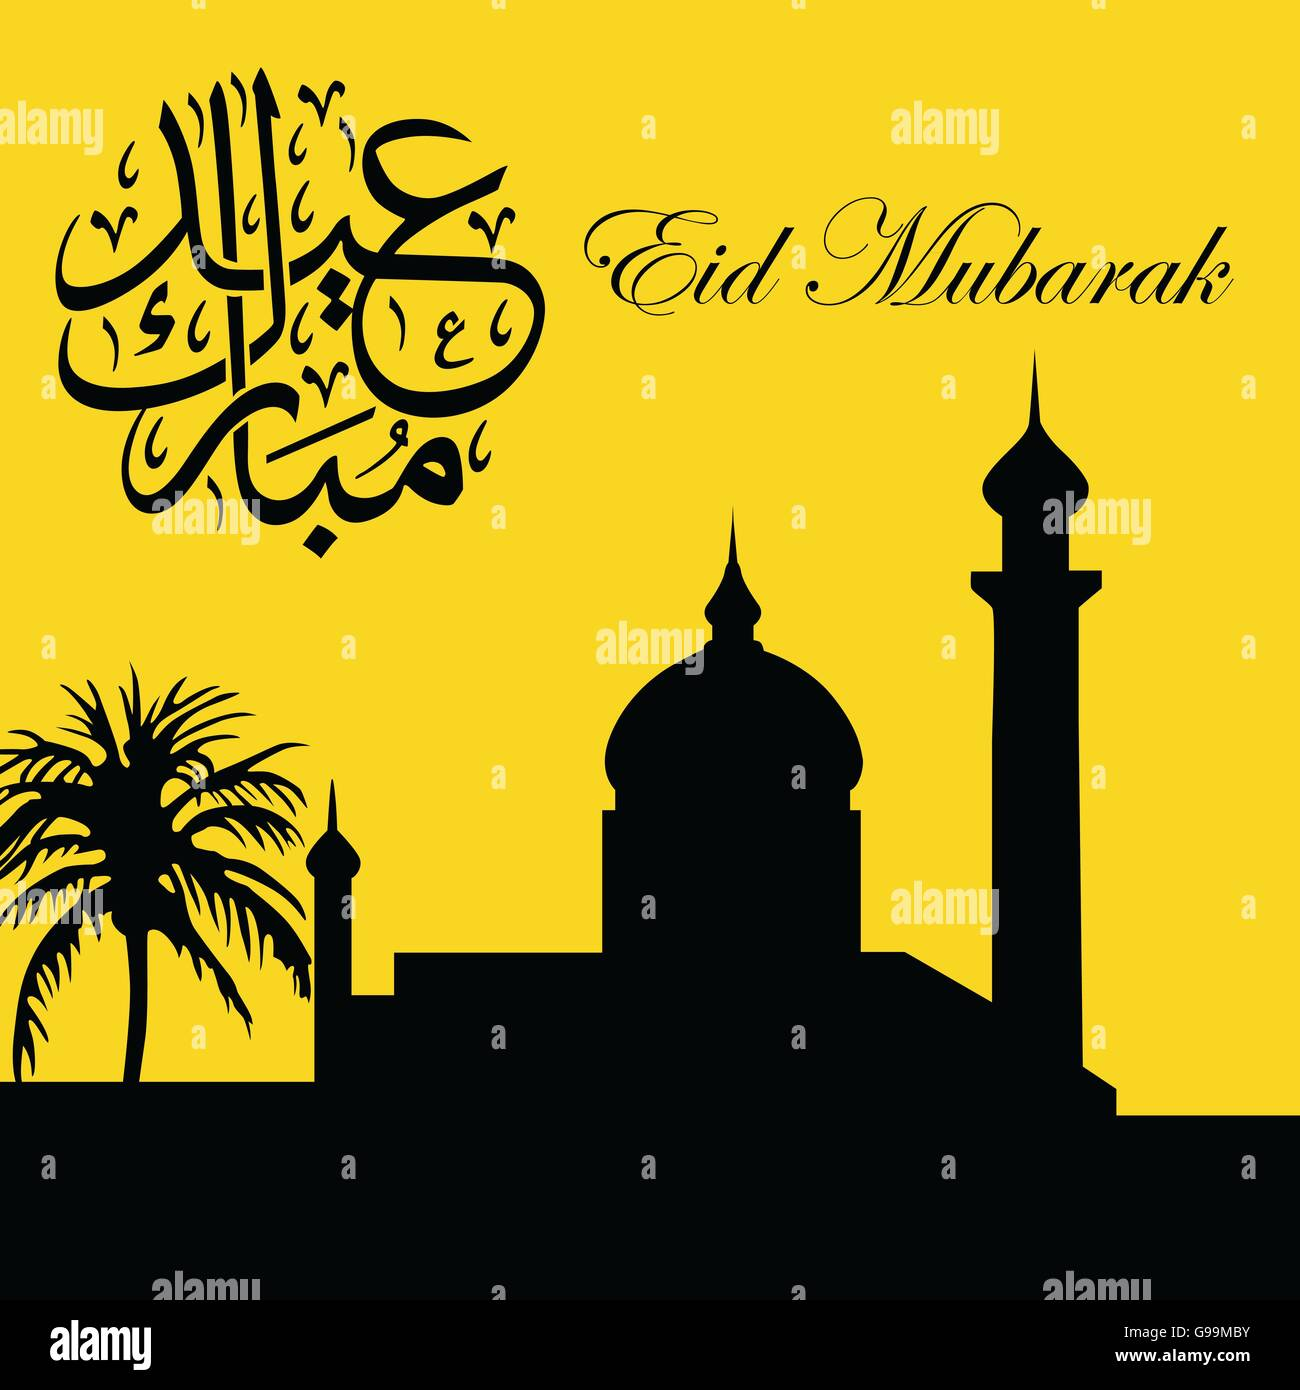 Eid Mubarak Greeting Card Stock Photos Eid Mubarak Greeting Card